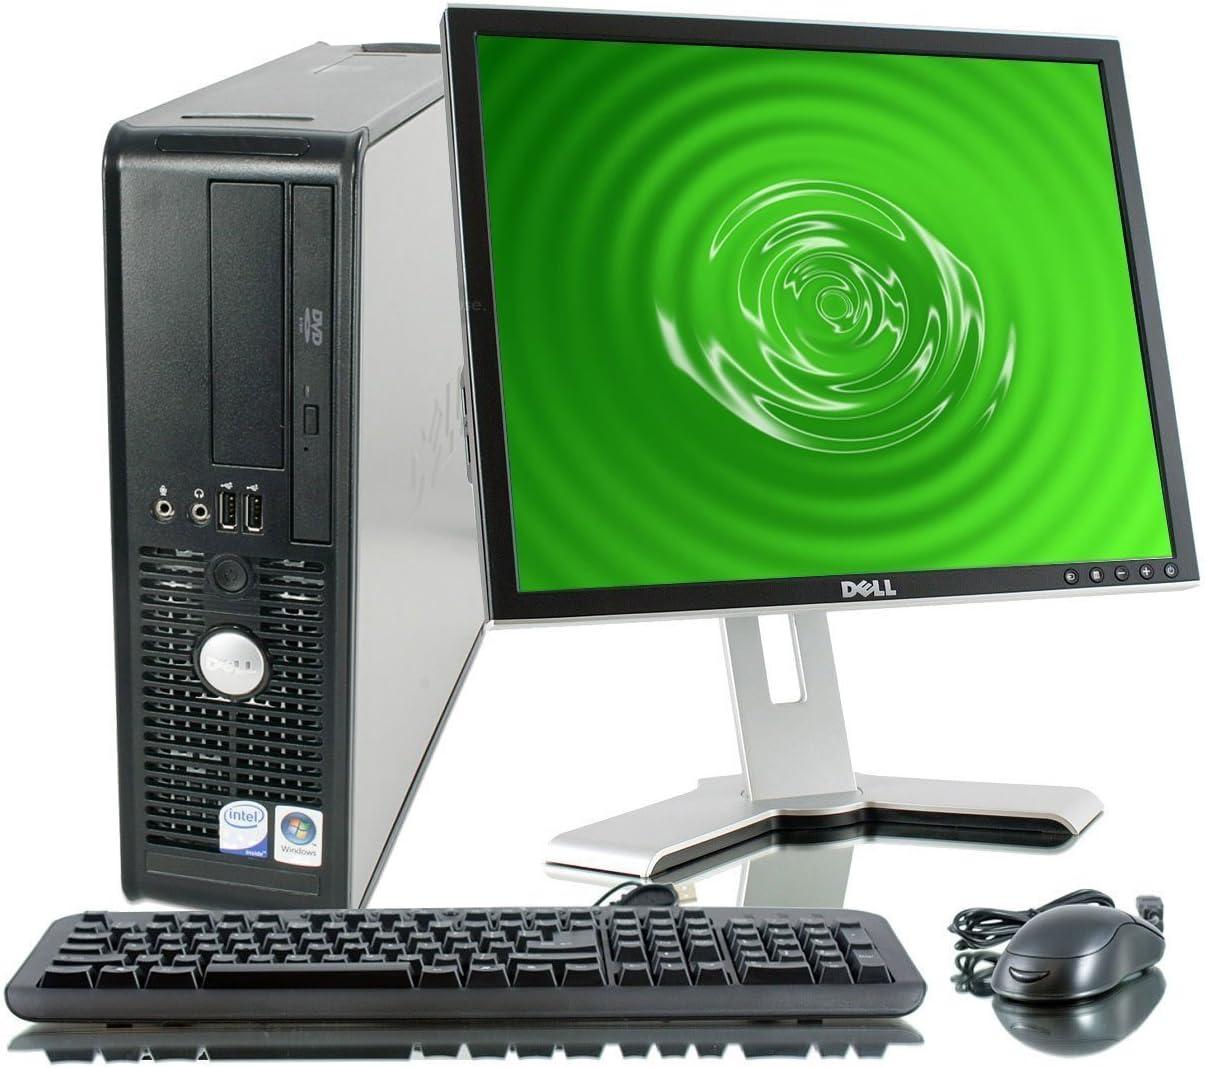 Dell Optiplex Desktop 2.93 GHz Intel Core 2 Duo Processor, New 8GB RAM DDR2, 250GB , Windows 10 Professional x64, 19in LCD Monitor (brands vary) - (Renewed)